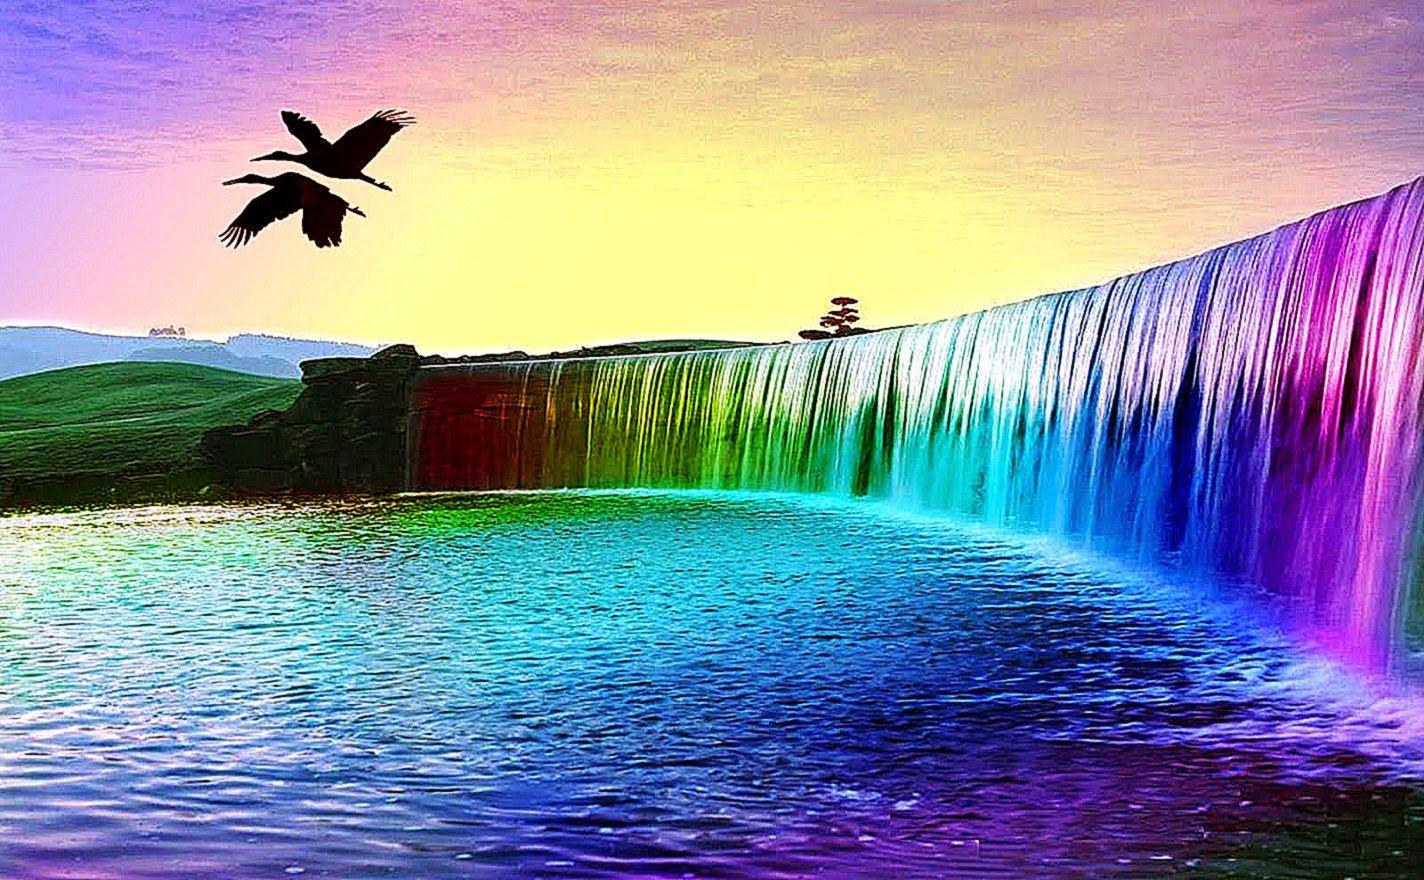 3D Waterfall Wallpapers Desktop